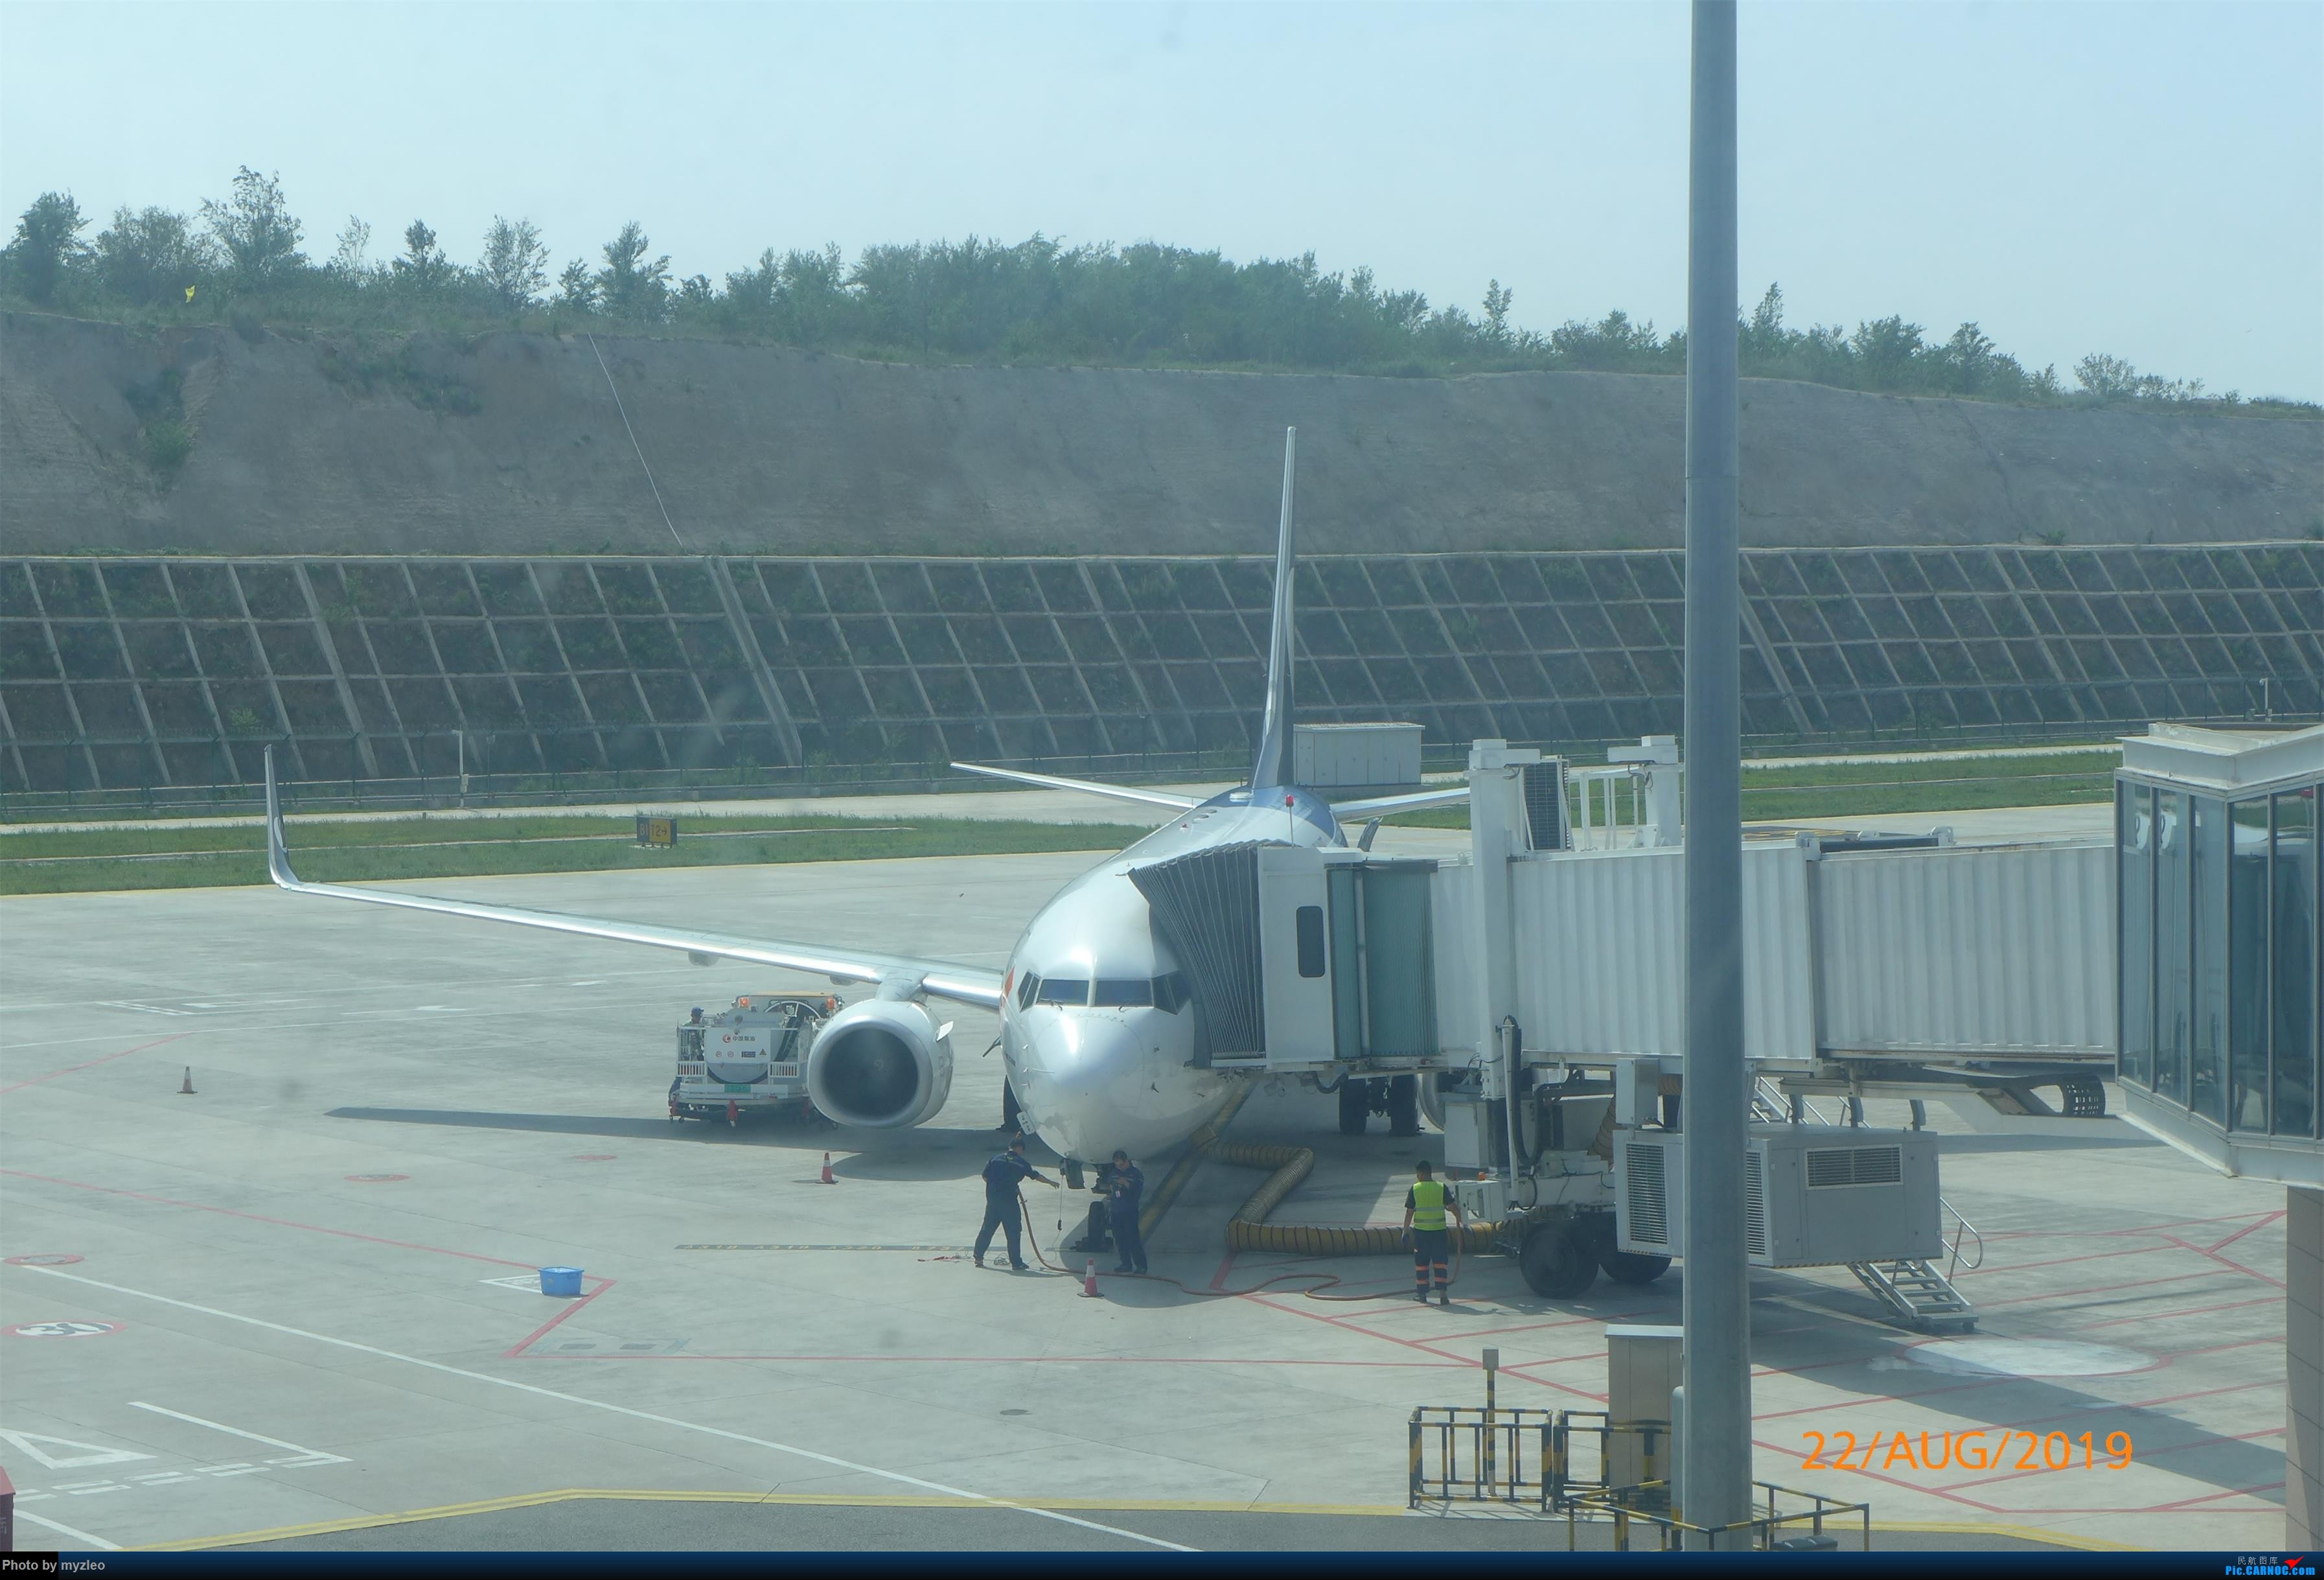 Re:[原创]【myzleo的游记5.2】梦圆一九(2)首访南苑把梦圆,初搭巴航连新缘 BOEING 737-800  中国烟台蓬莱国际机场